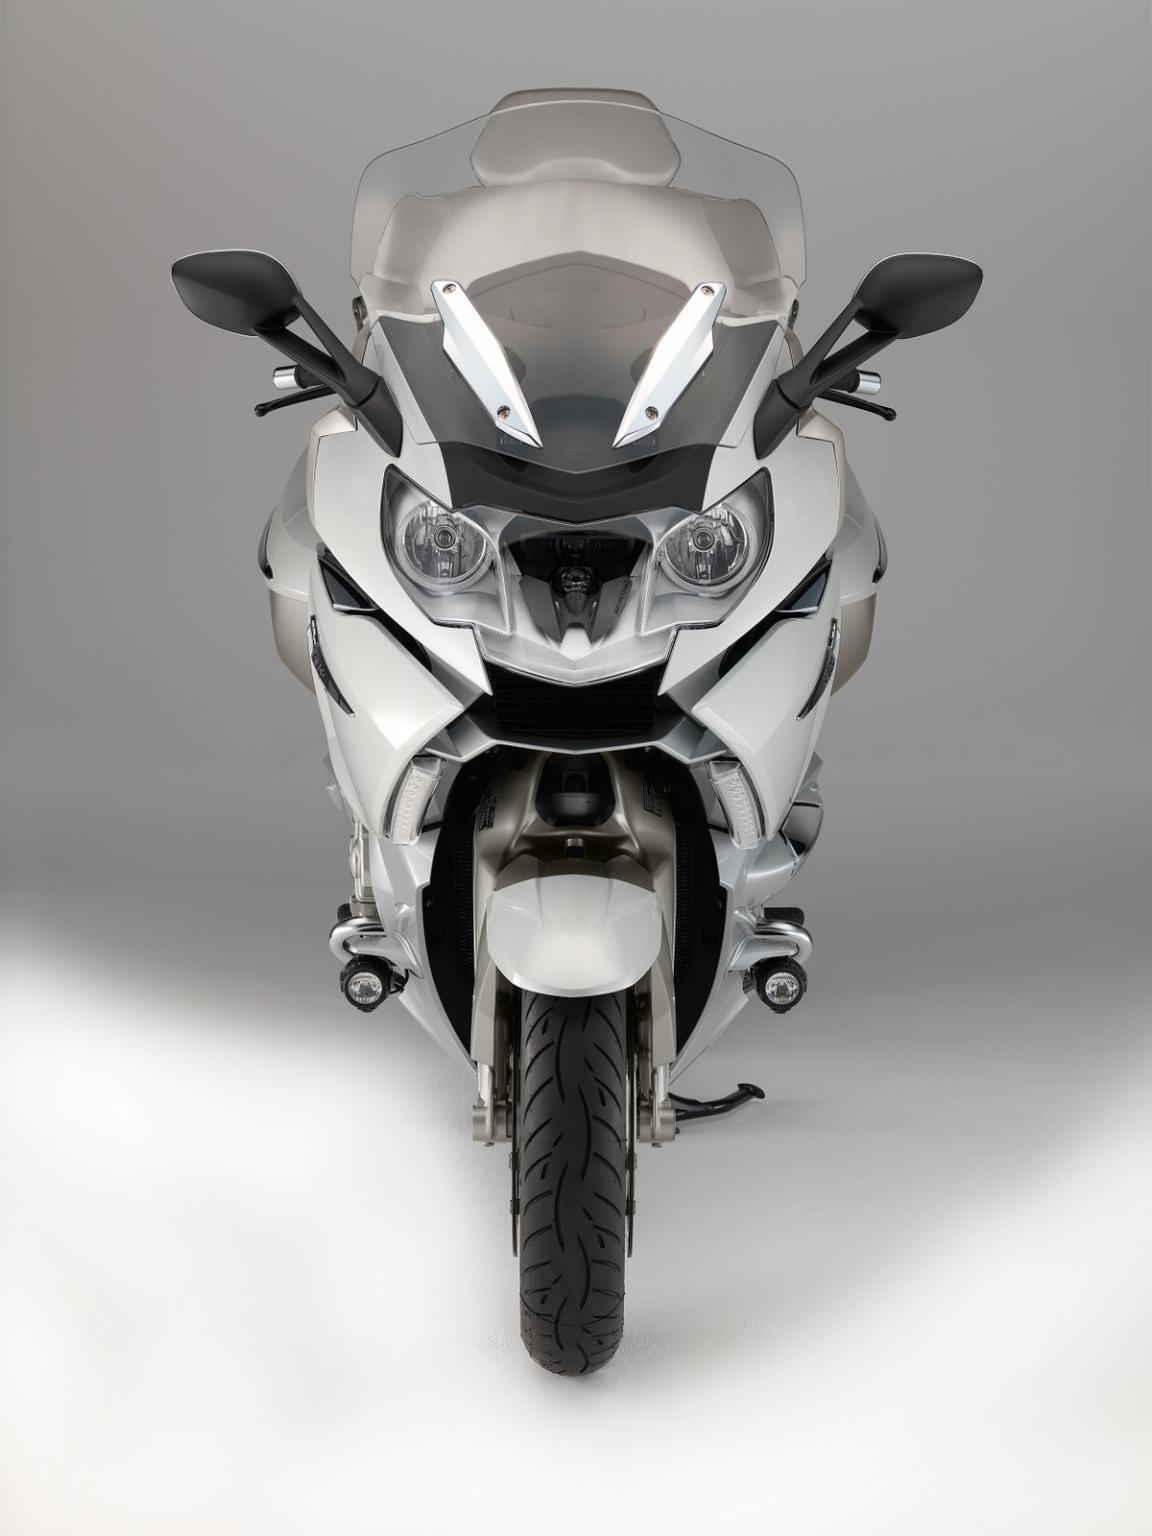 http://www.motorrad-bilder.at/slideshows/291/010492/14-P90139427-highRes.jpg